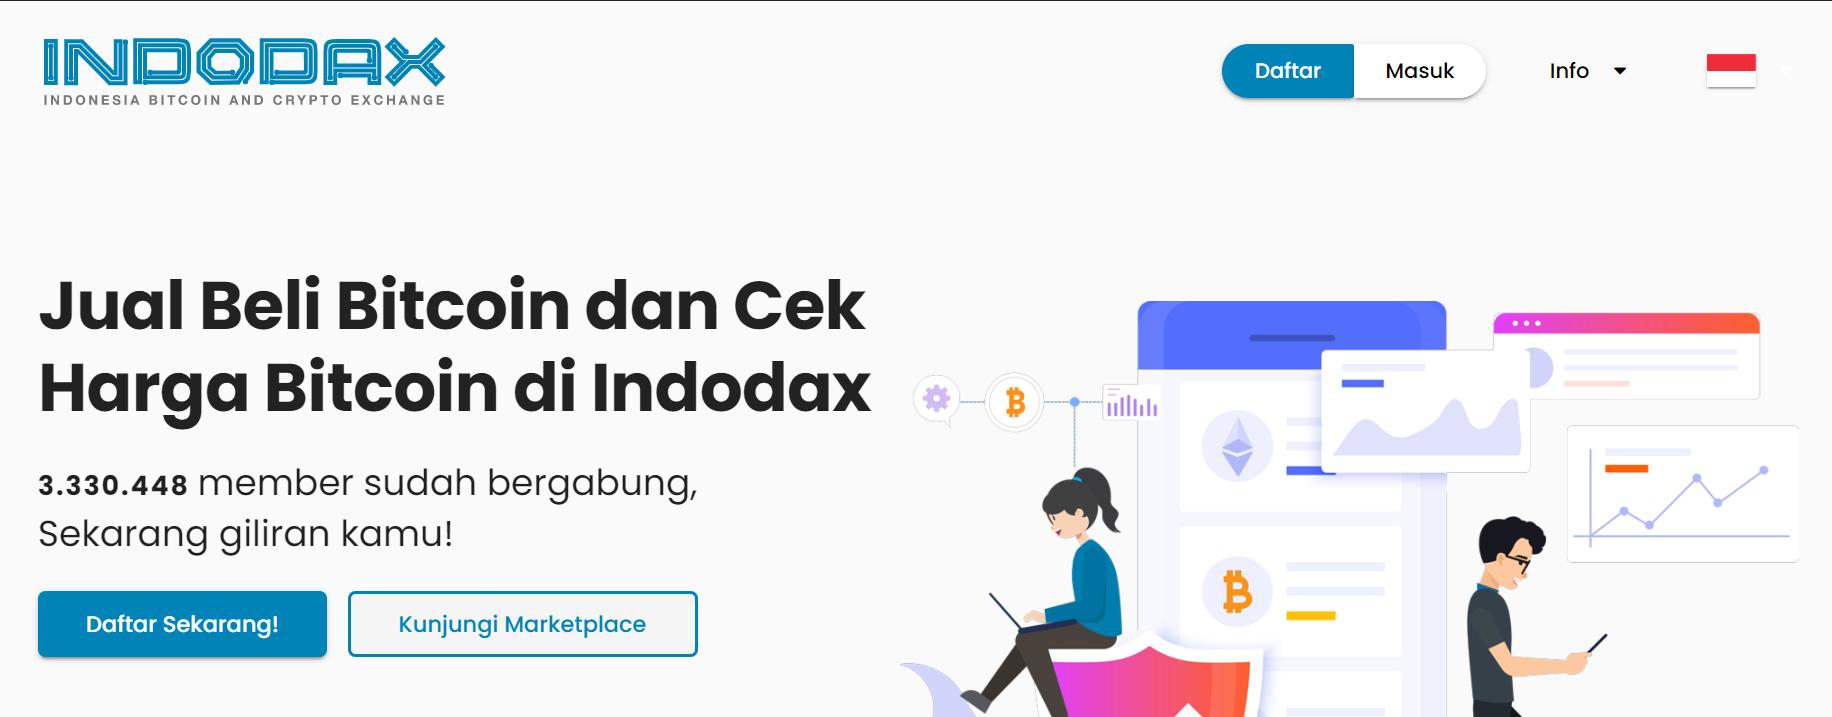 Situs indodax.com